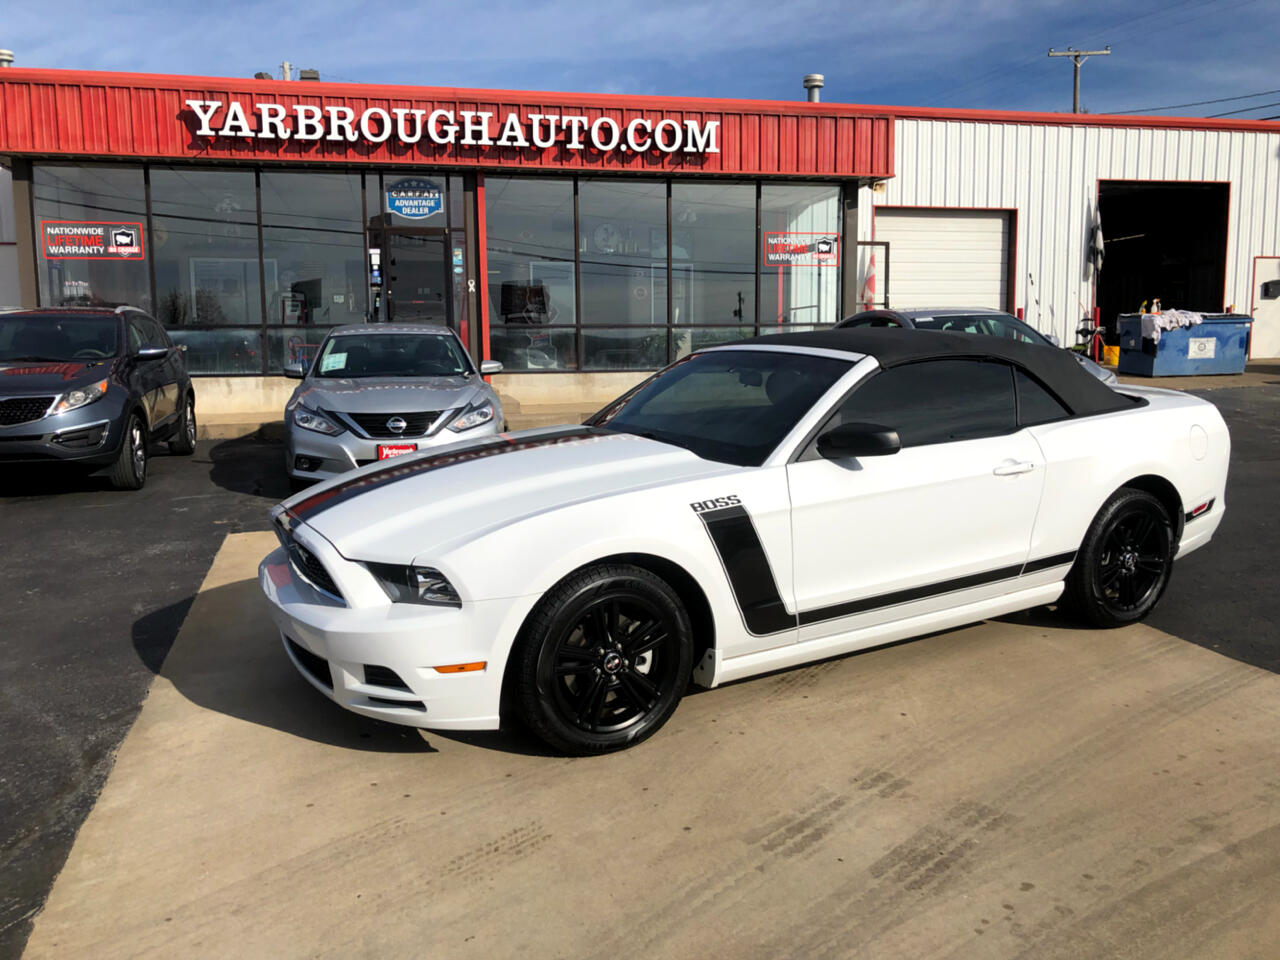 Ford Mustang 2dr Conv V6 2014